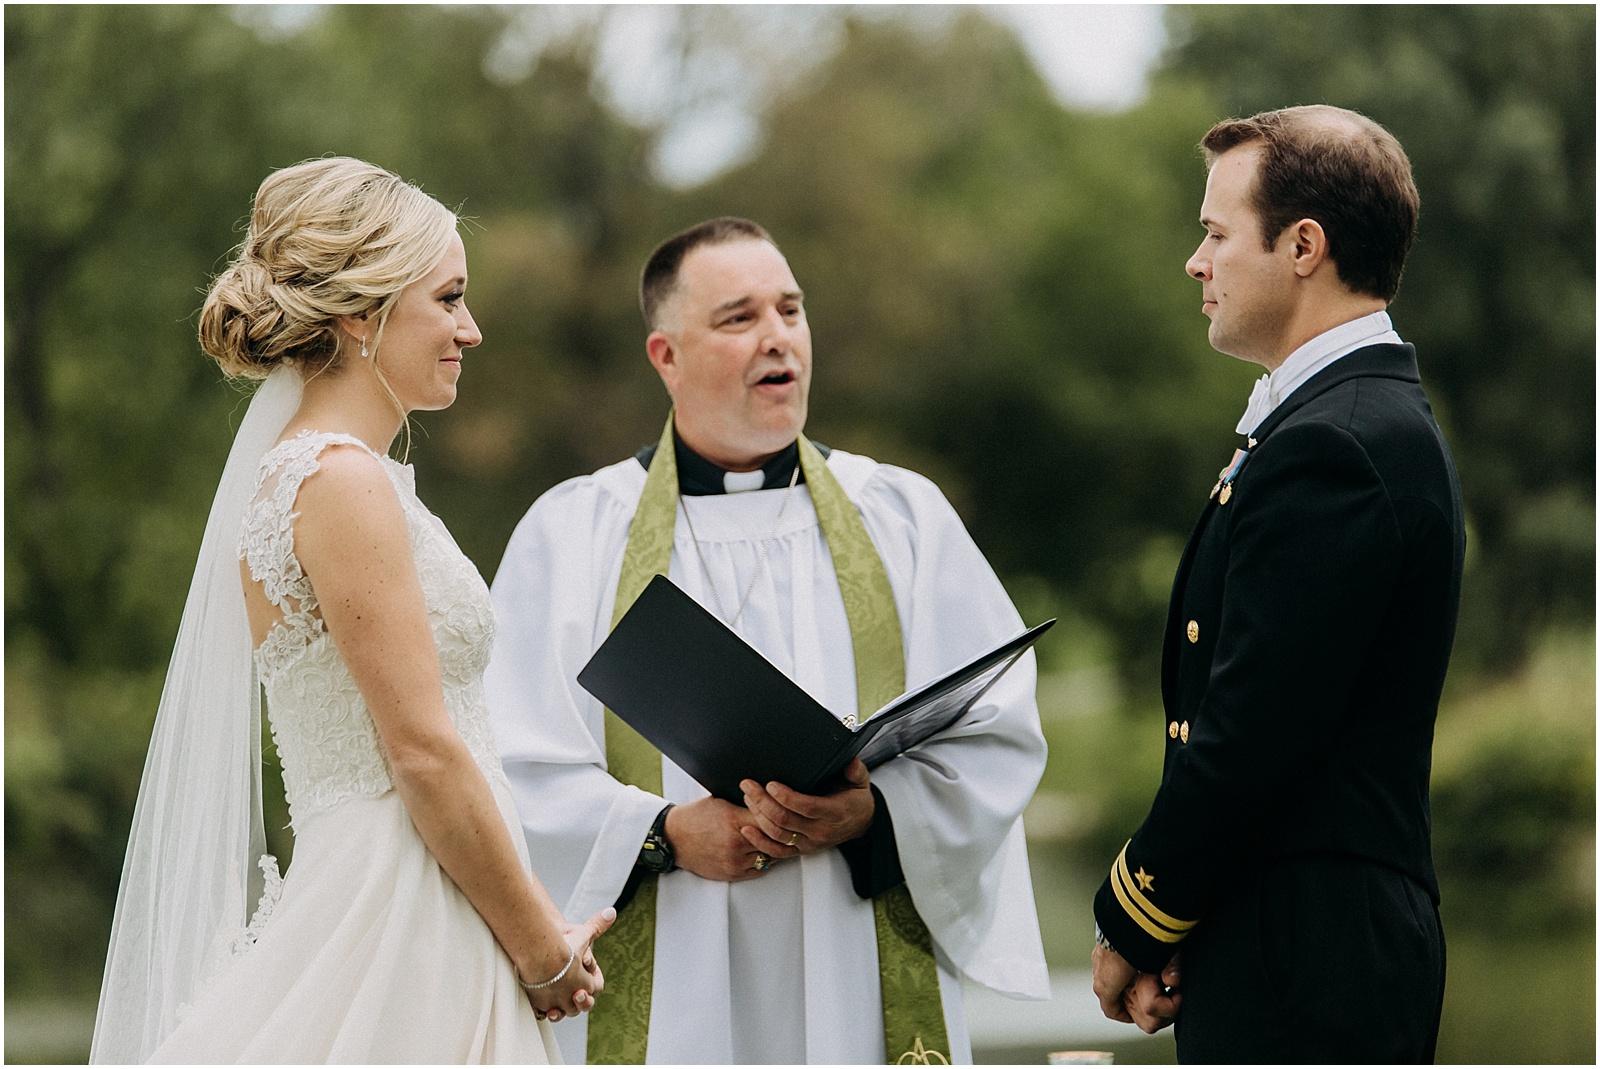 glen_echo_st_louis_mo_wedding_0103.jpg